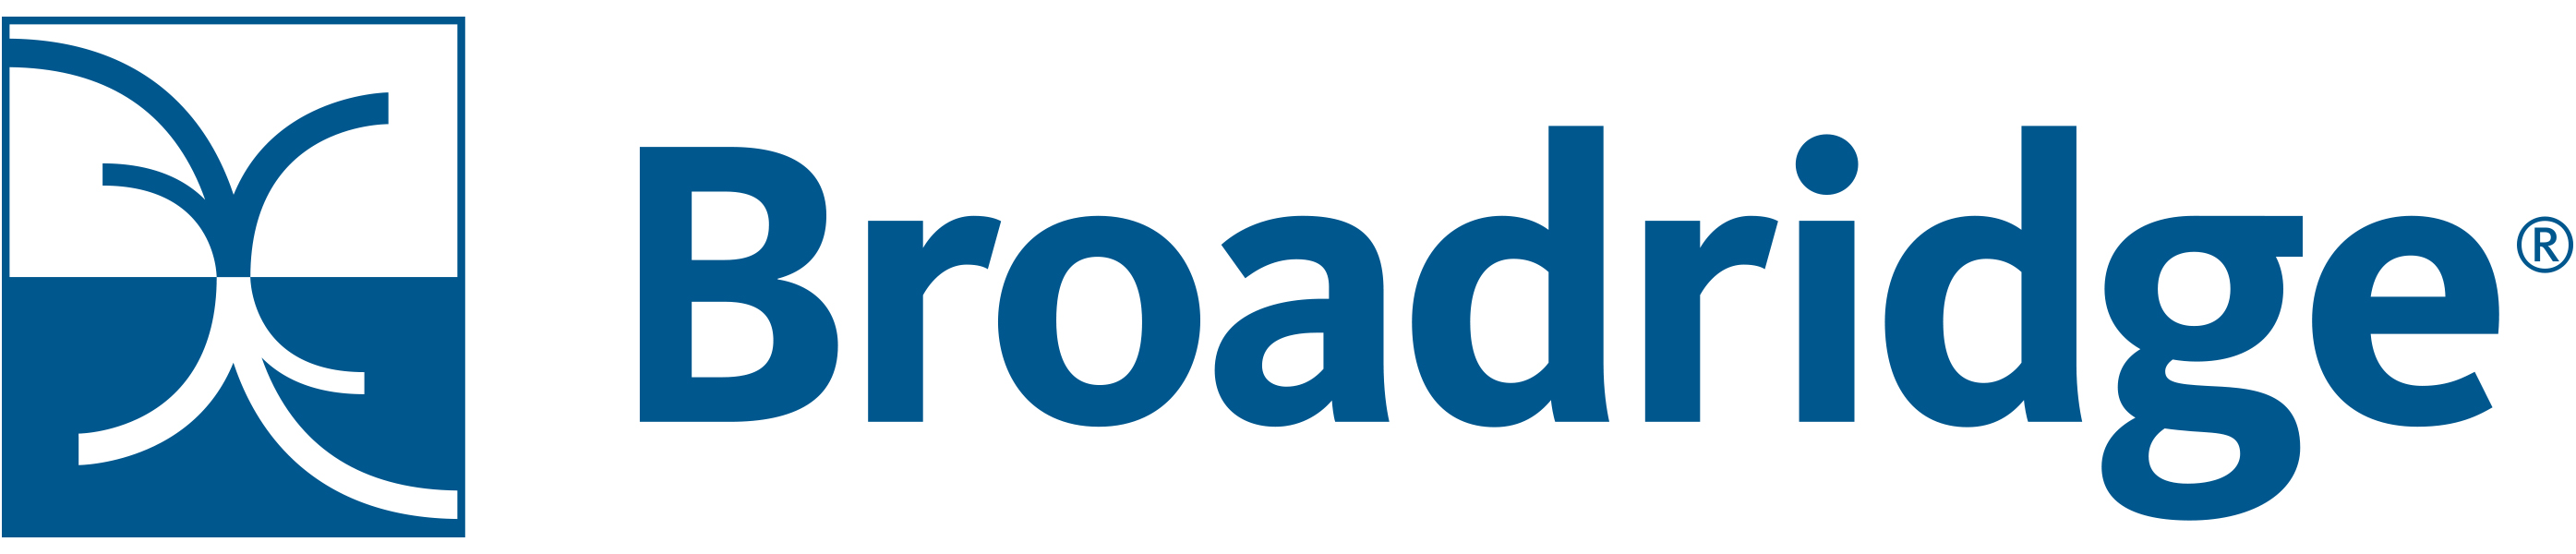 Broadridge Financial Solutions, Inc. logo